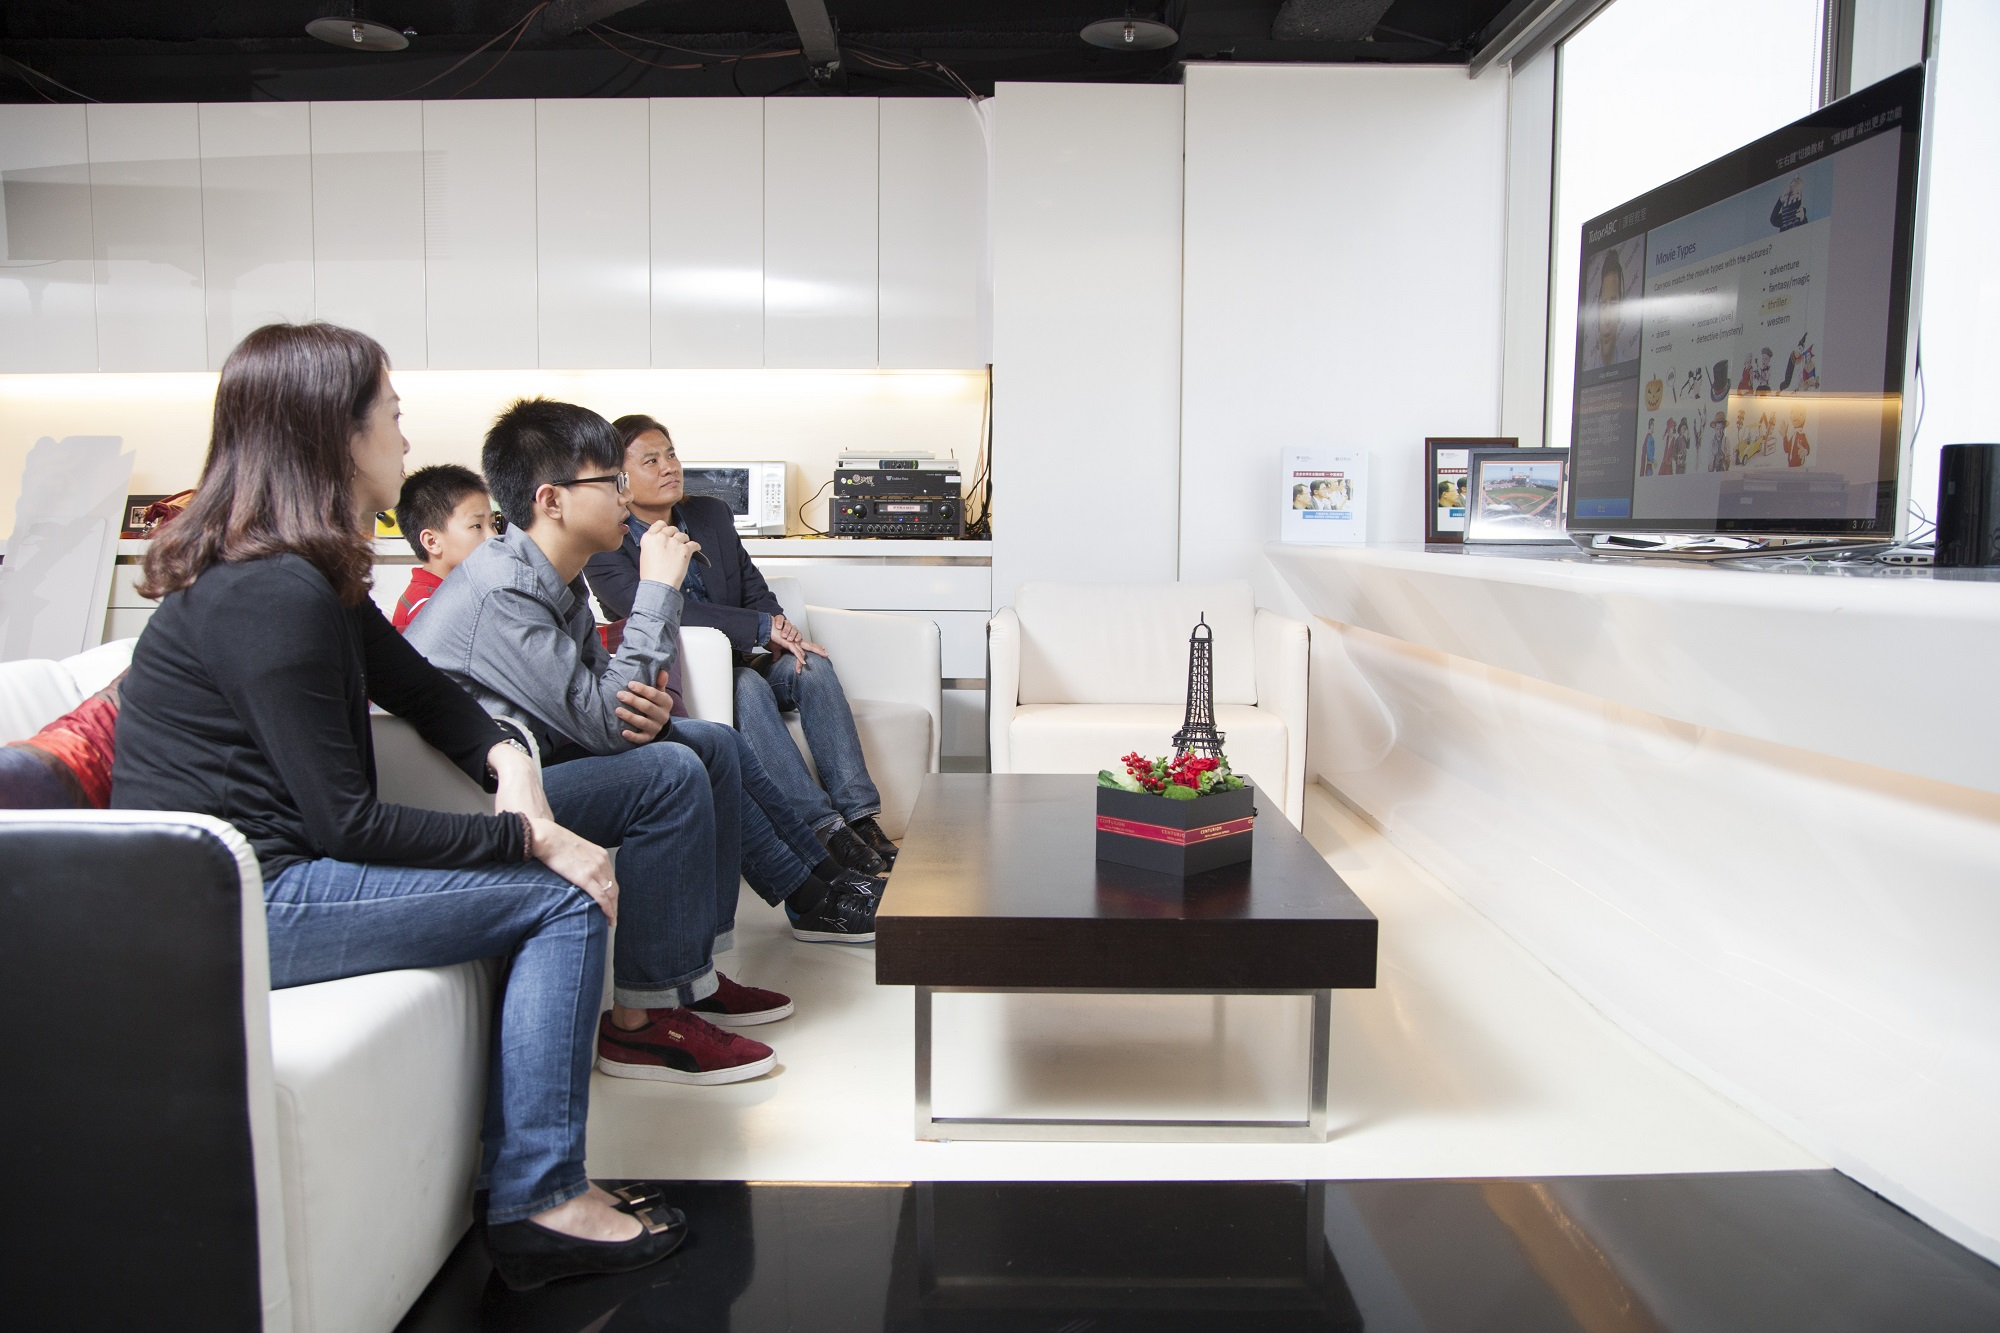 TutorABCJr見證人劉傳、劉芳兄弟檔線上英語課 全家同樂